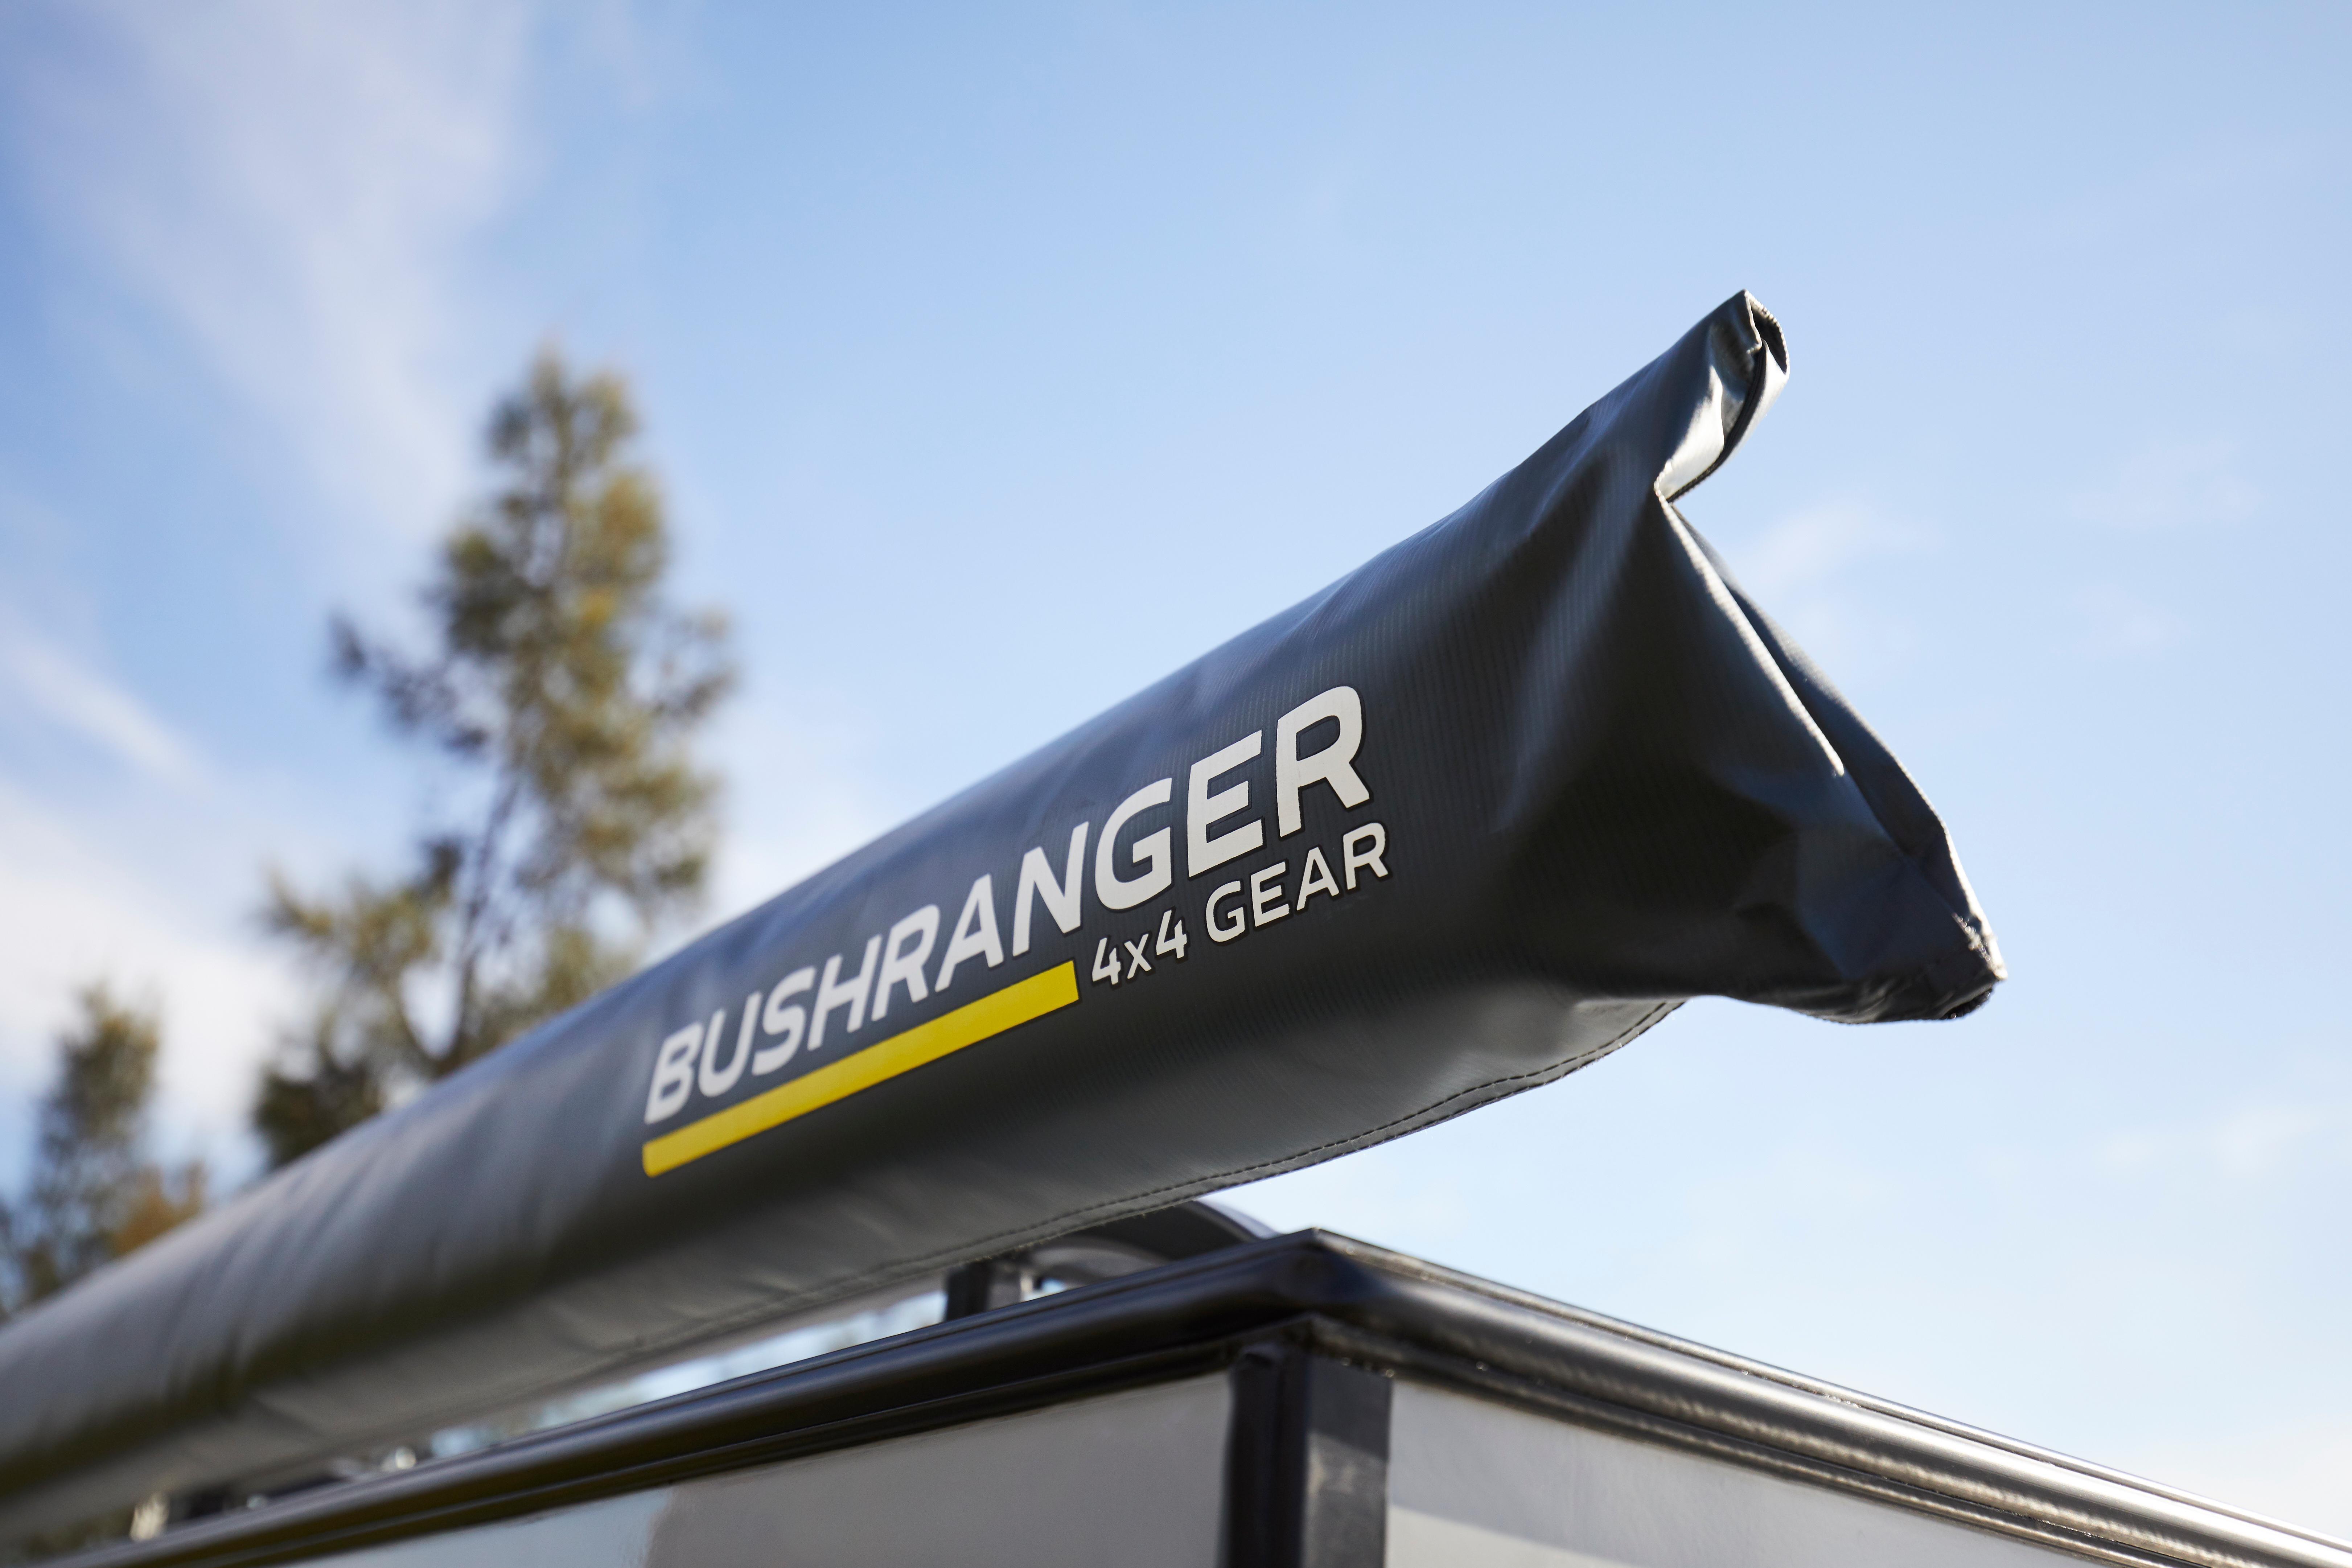 Bushranger Awning